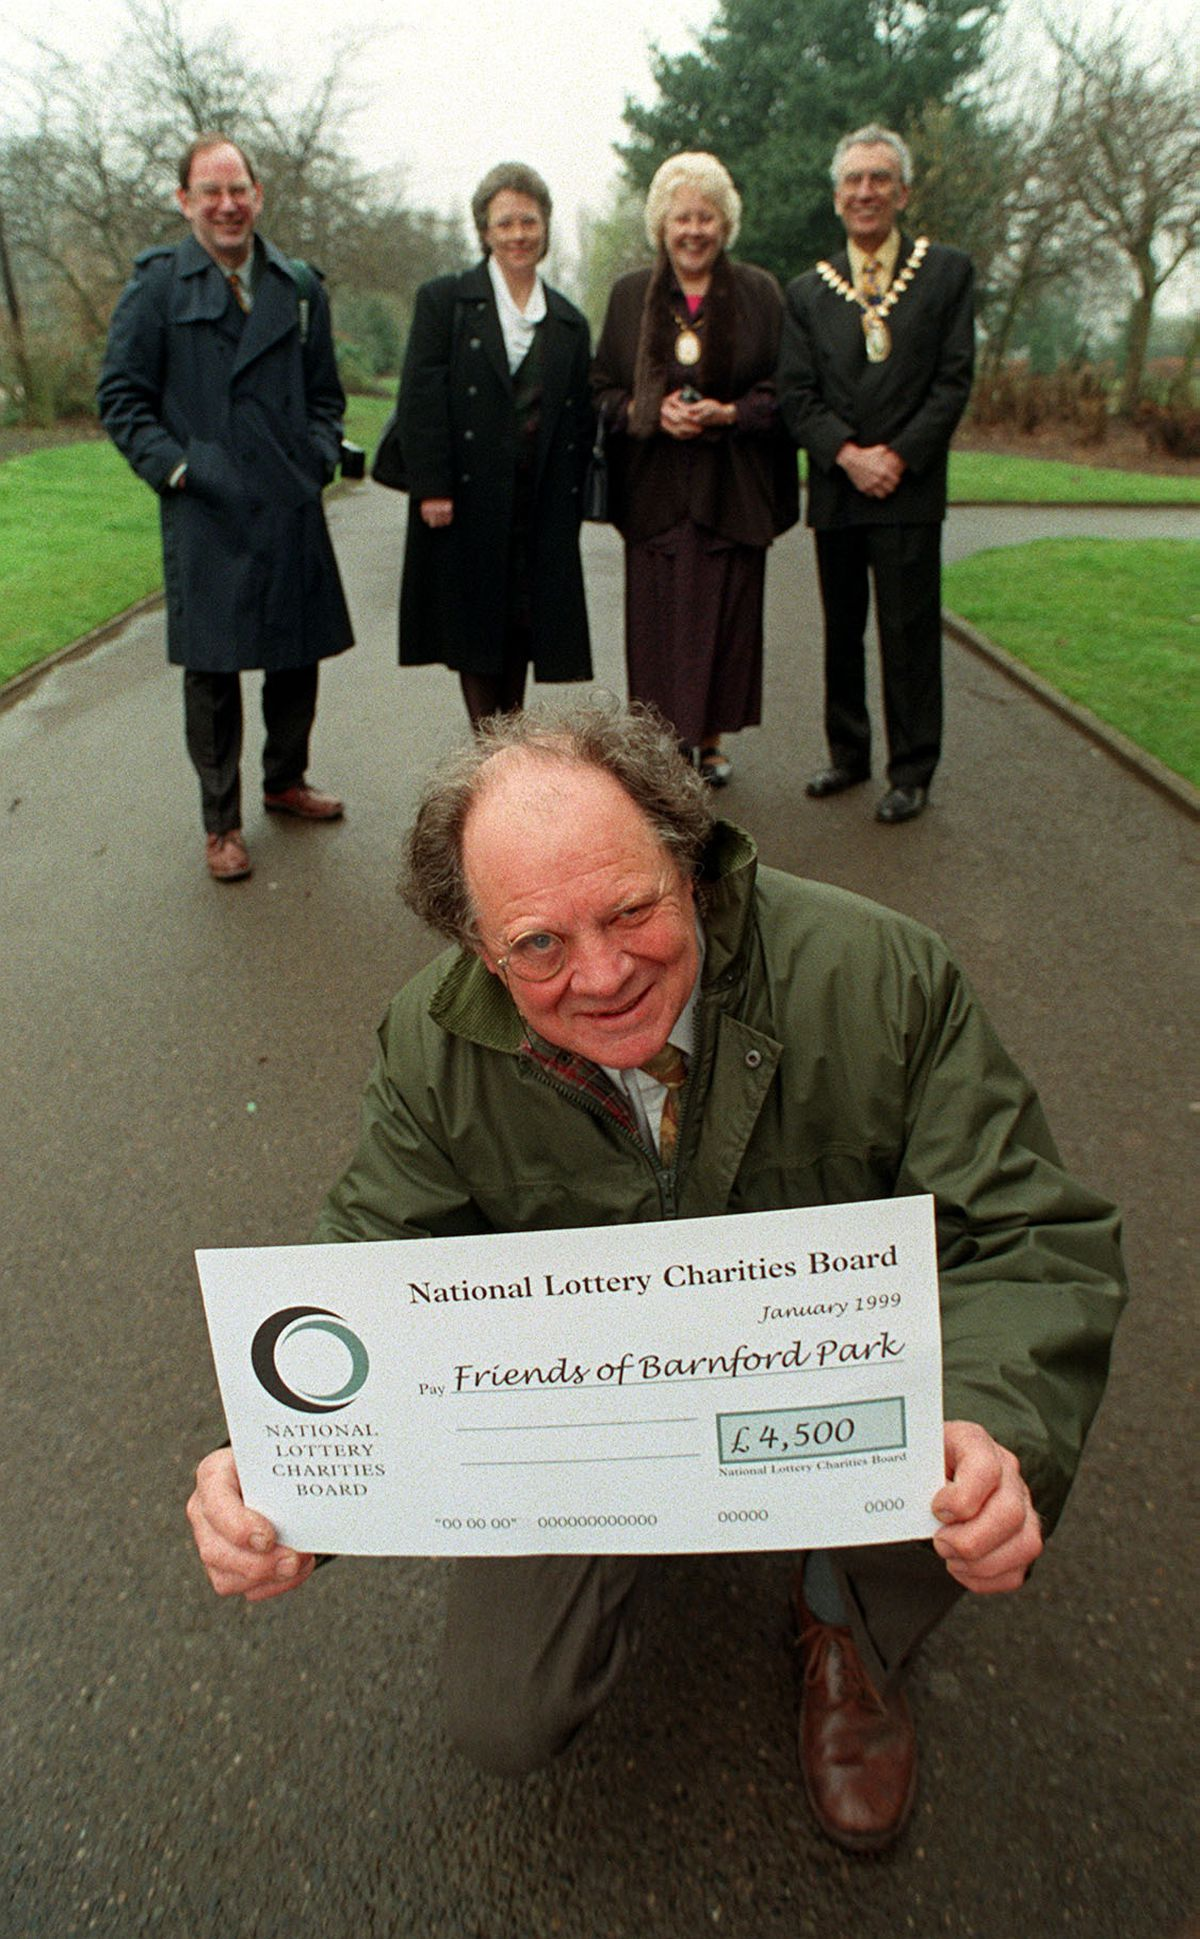 John Lloyd celebrates a lottery grant of £4,500 to refurbish Barnford Park, Oldbury